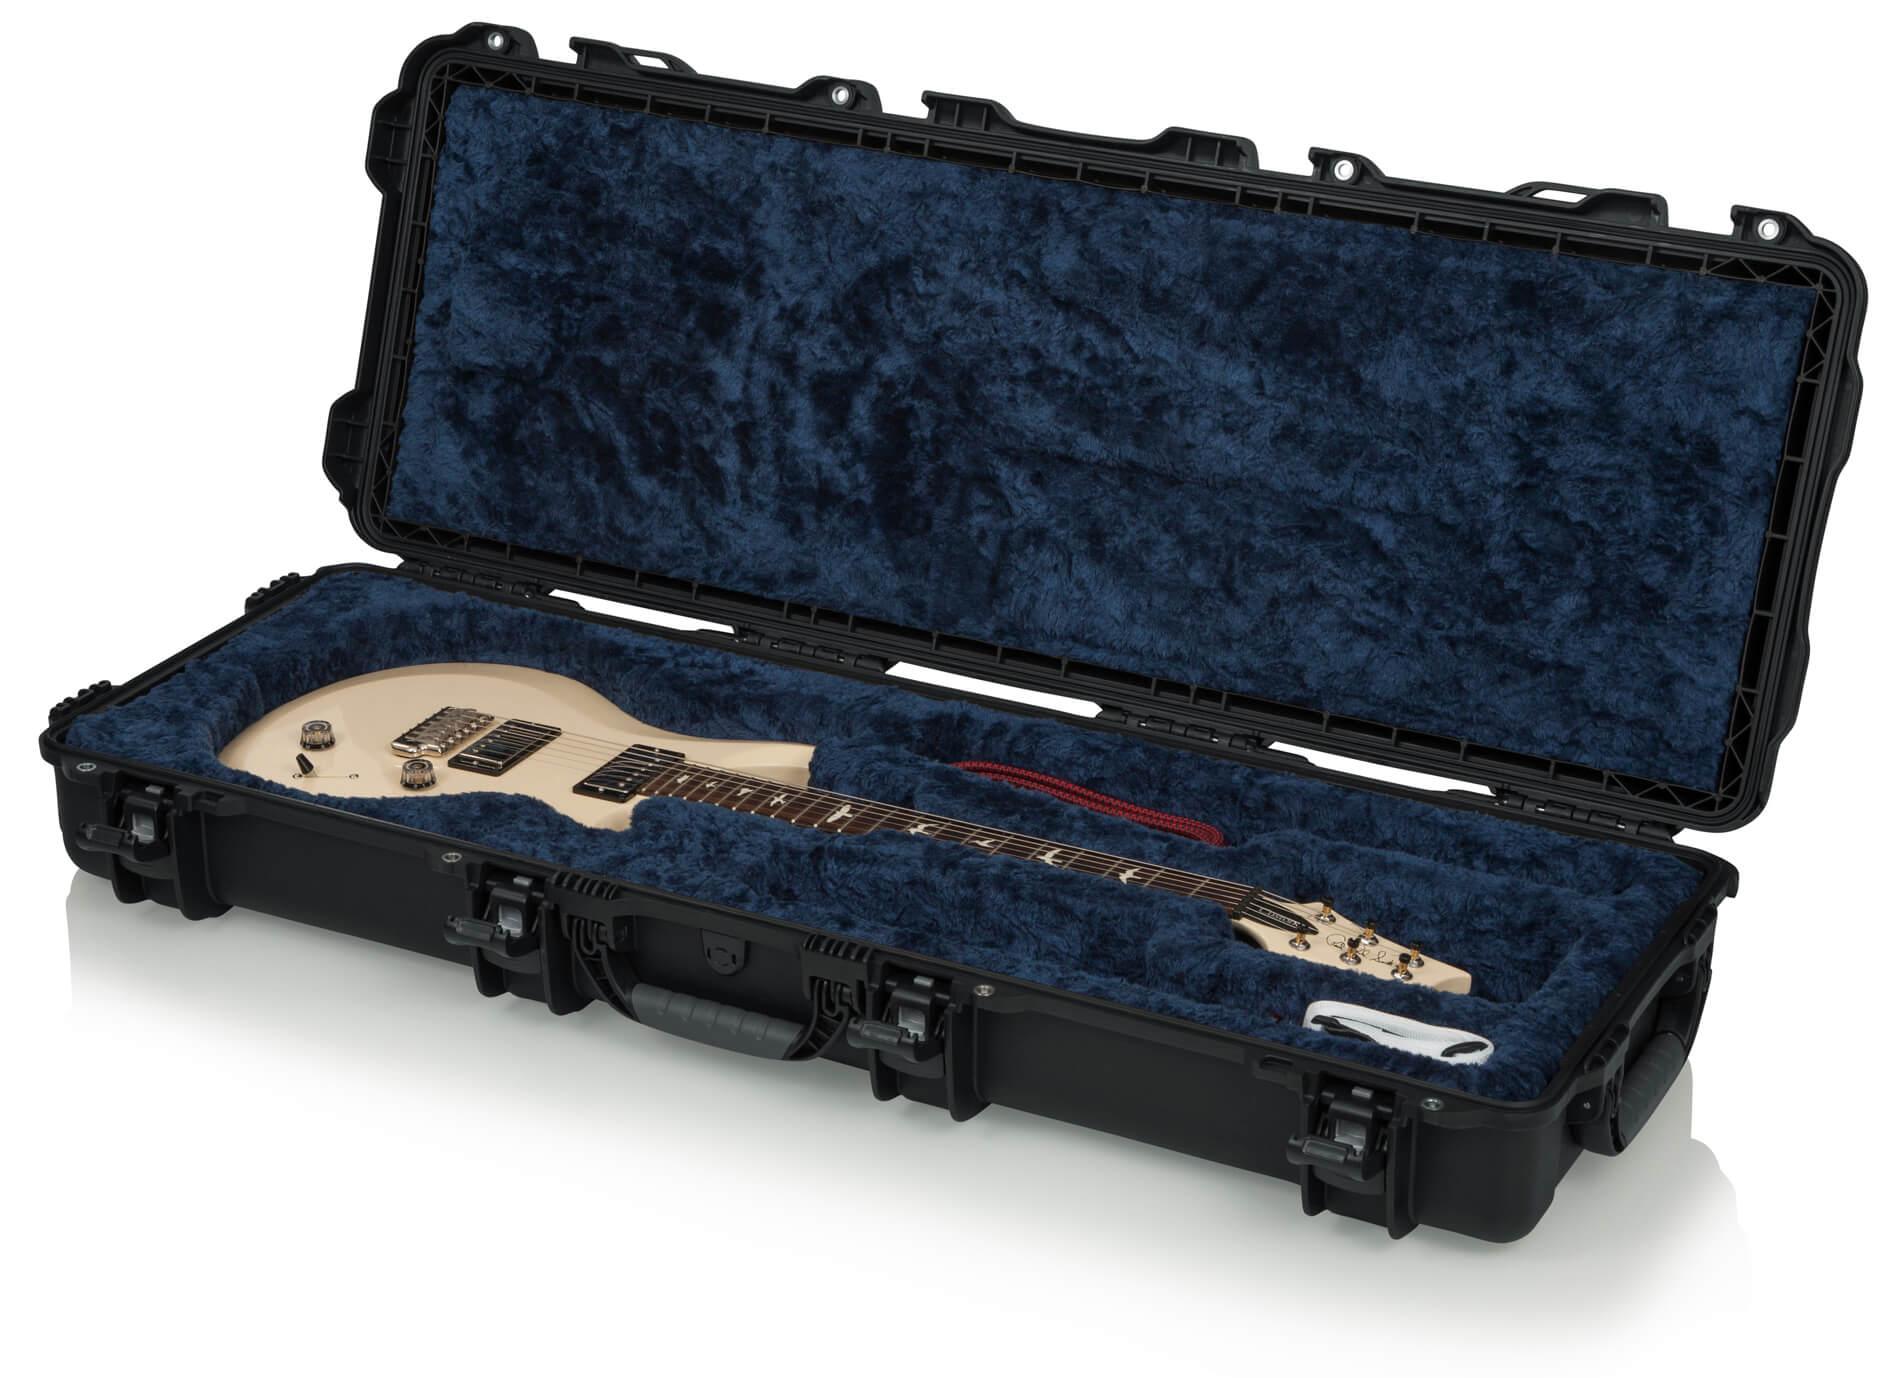 8c1bdb94f6d Series  Titan Guitar Case - Gator Cases